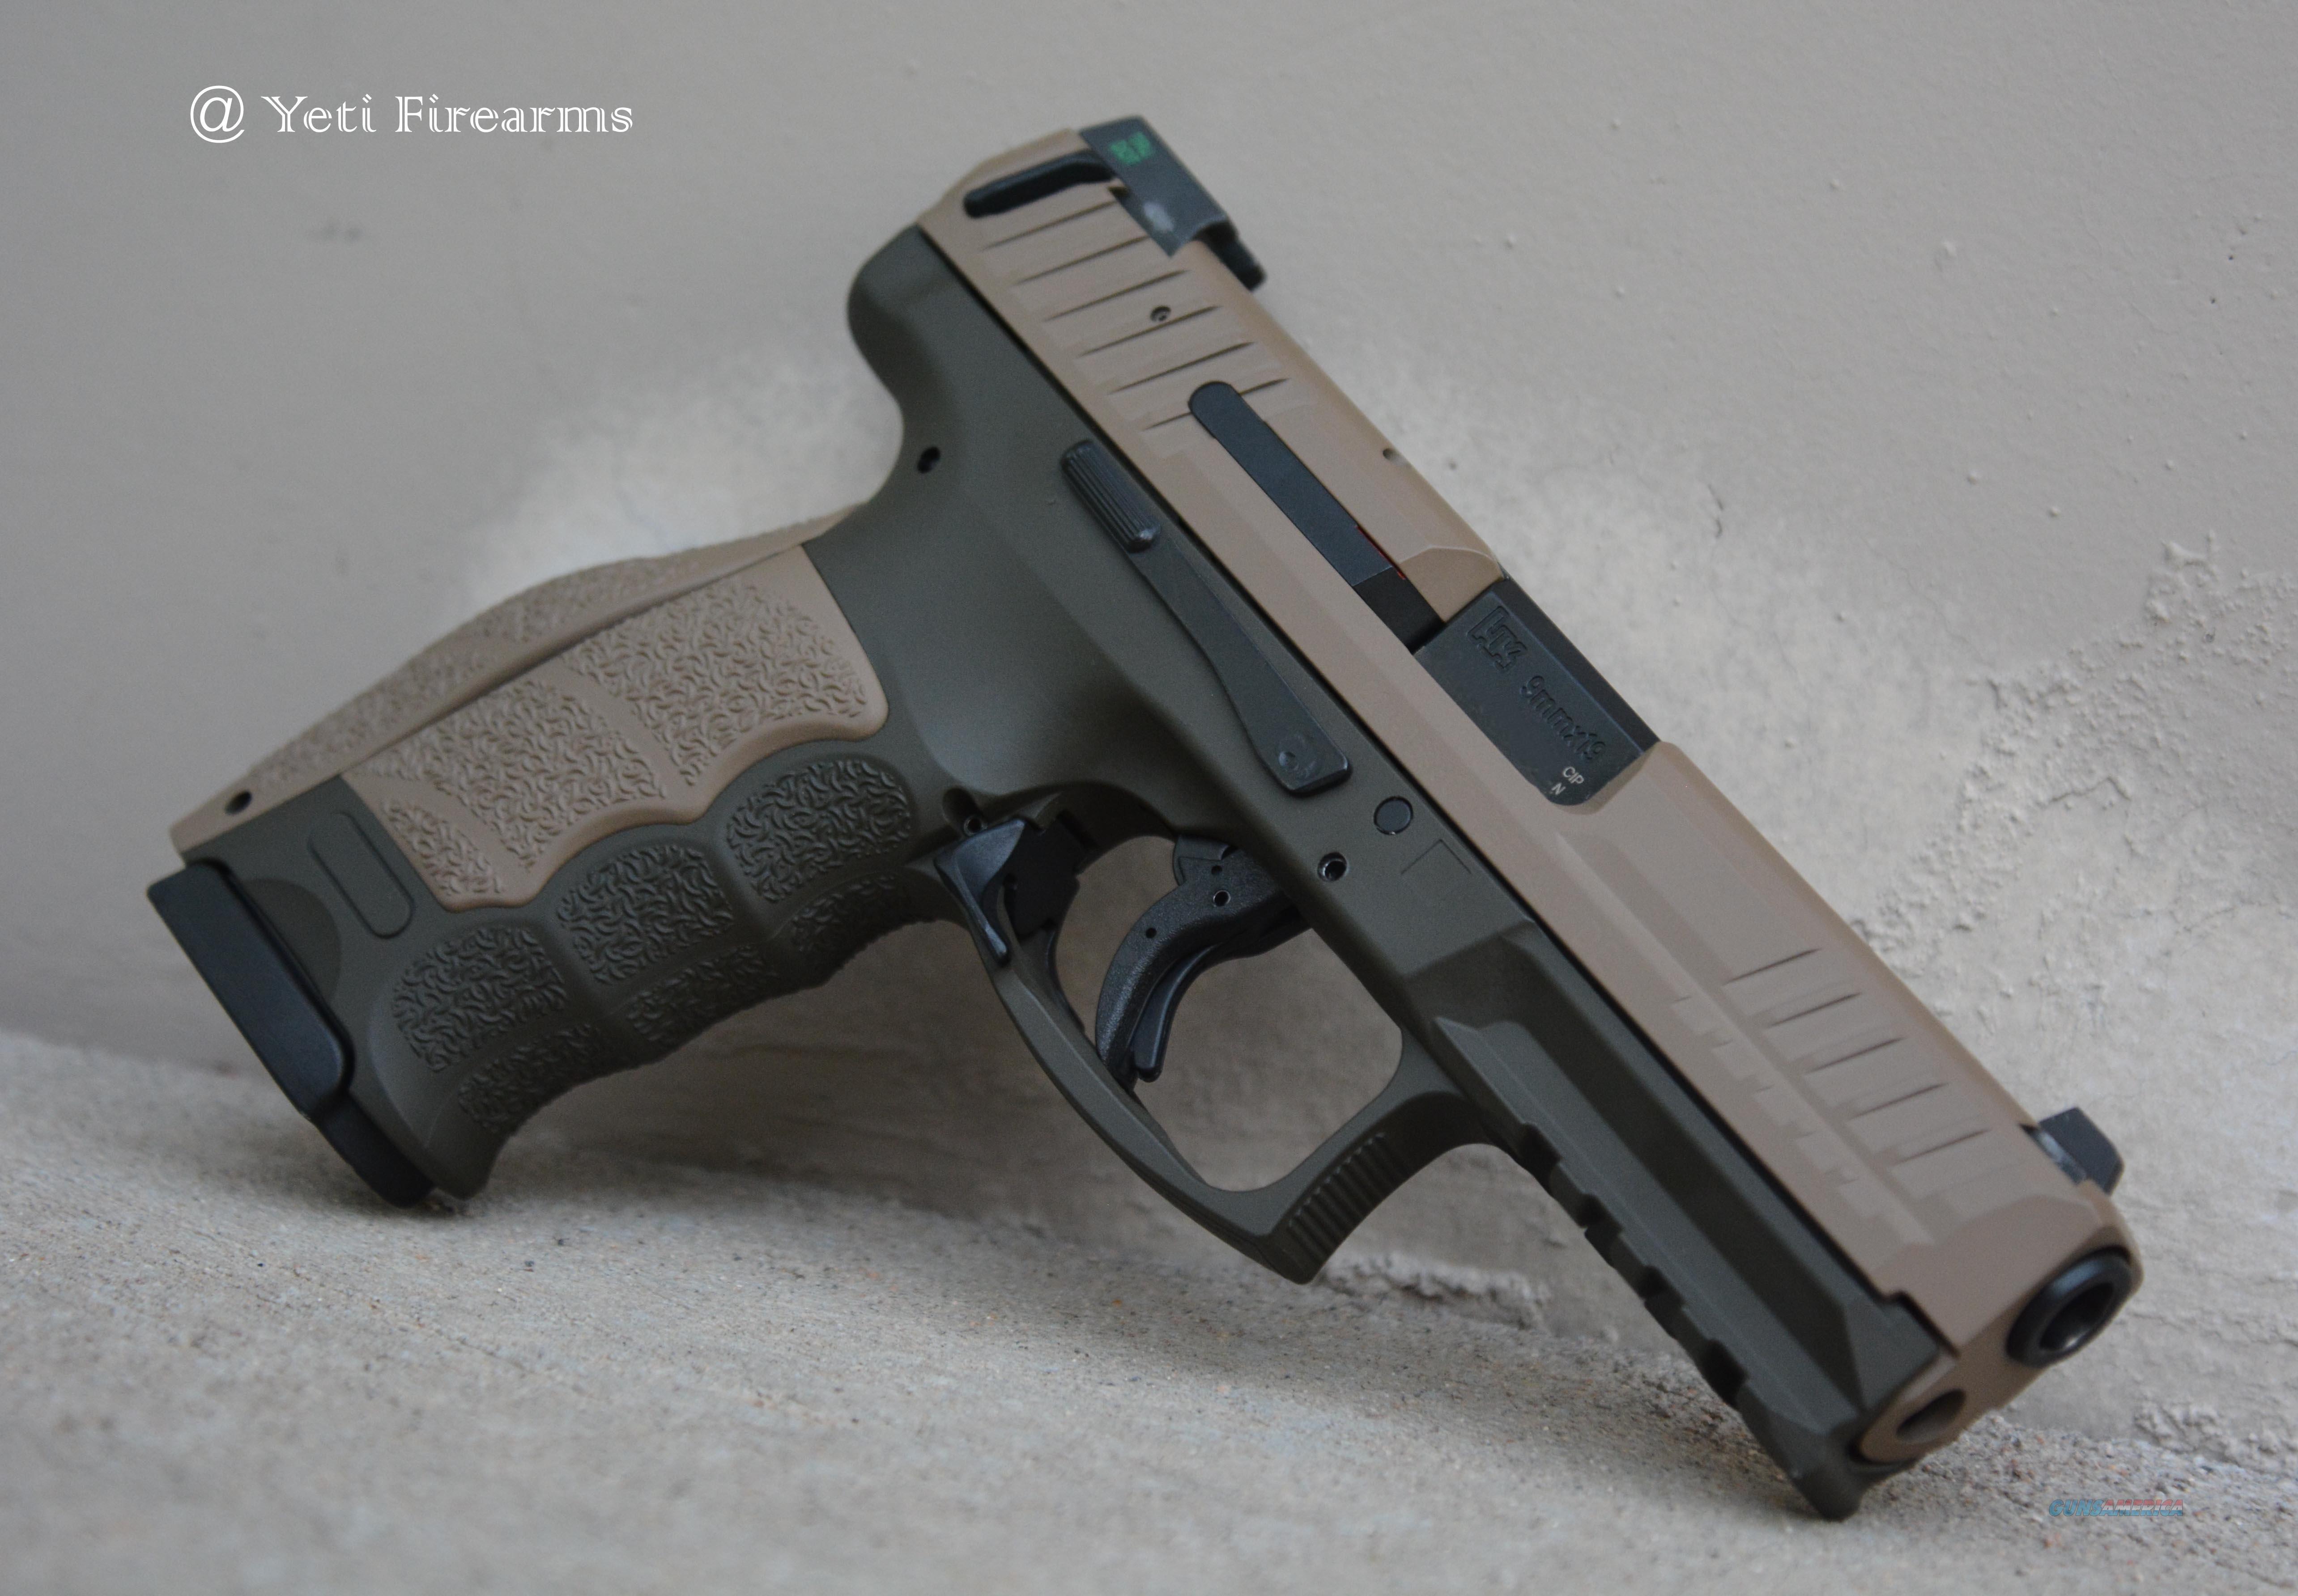 hugo boss shoes hk parts vp9 pistol accessories